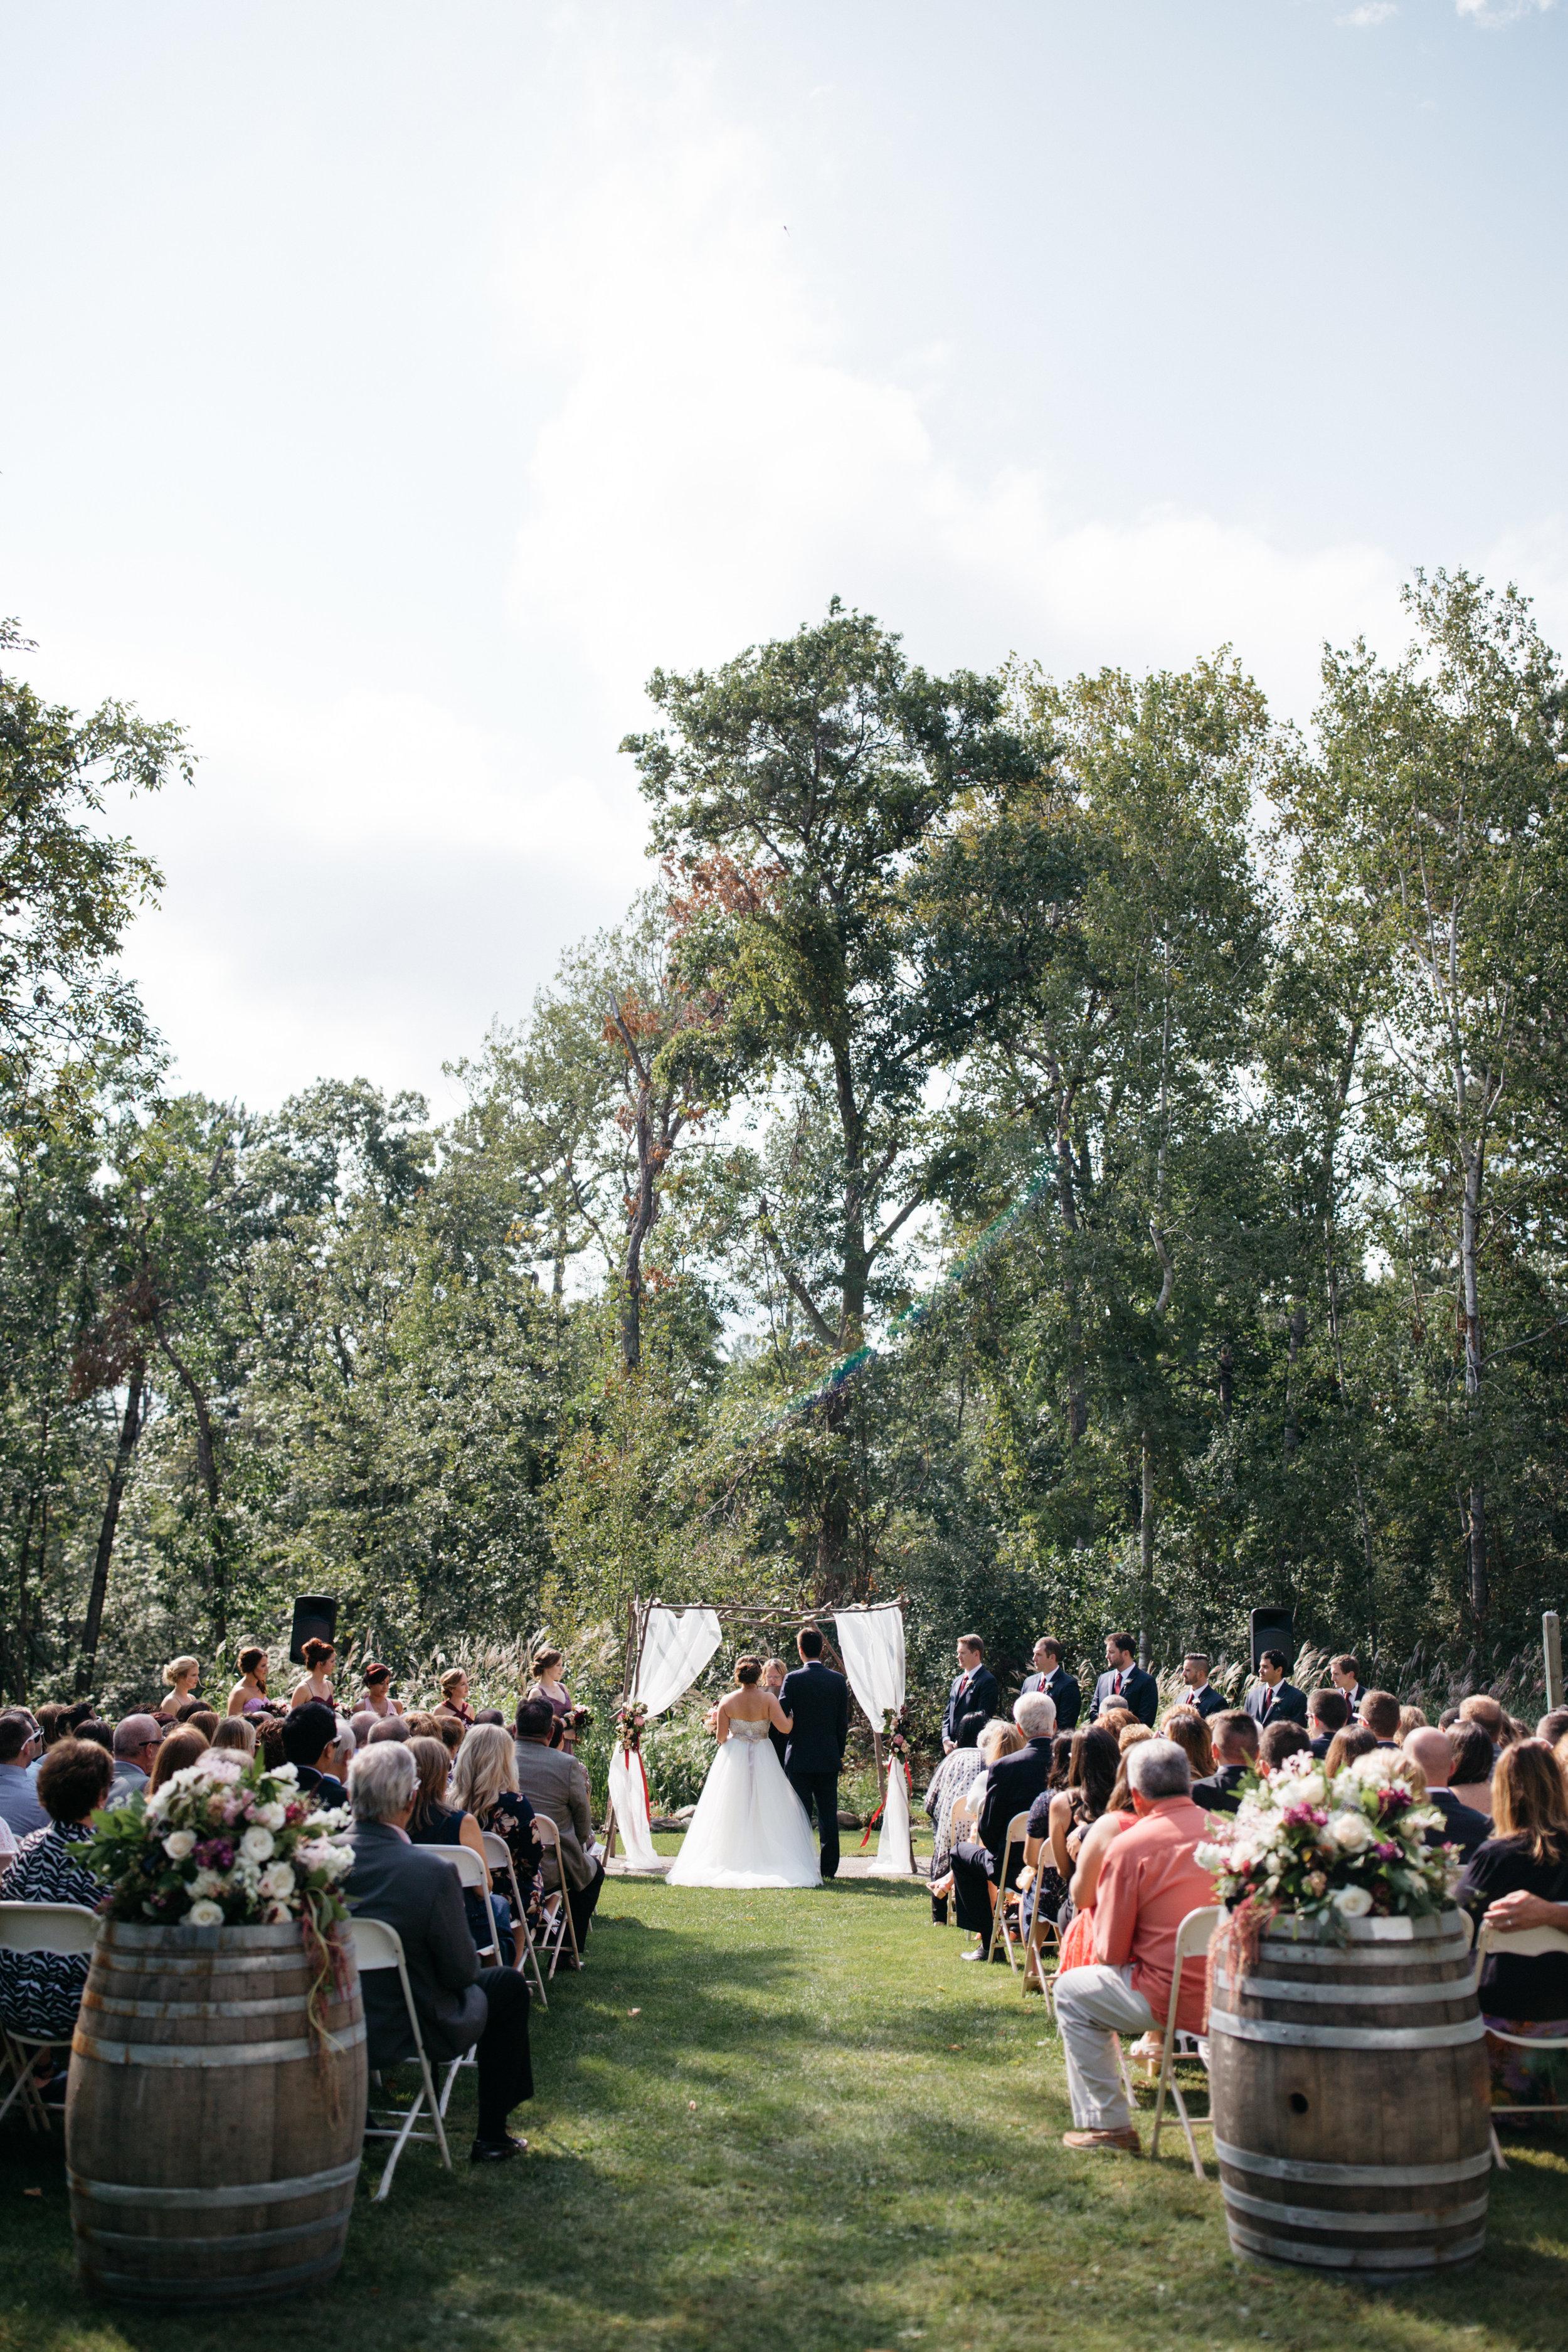 Italian gardens wedding at Grand View Lodge, photography by Britt DeZeeuw